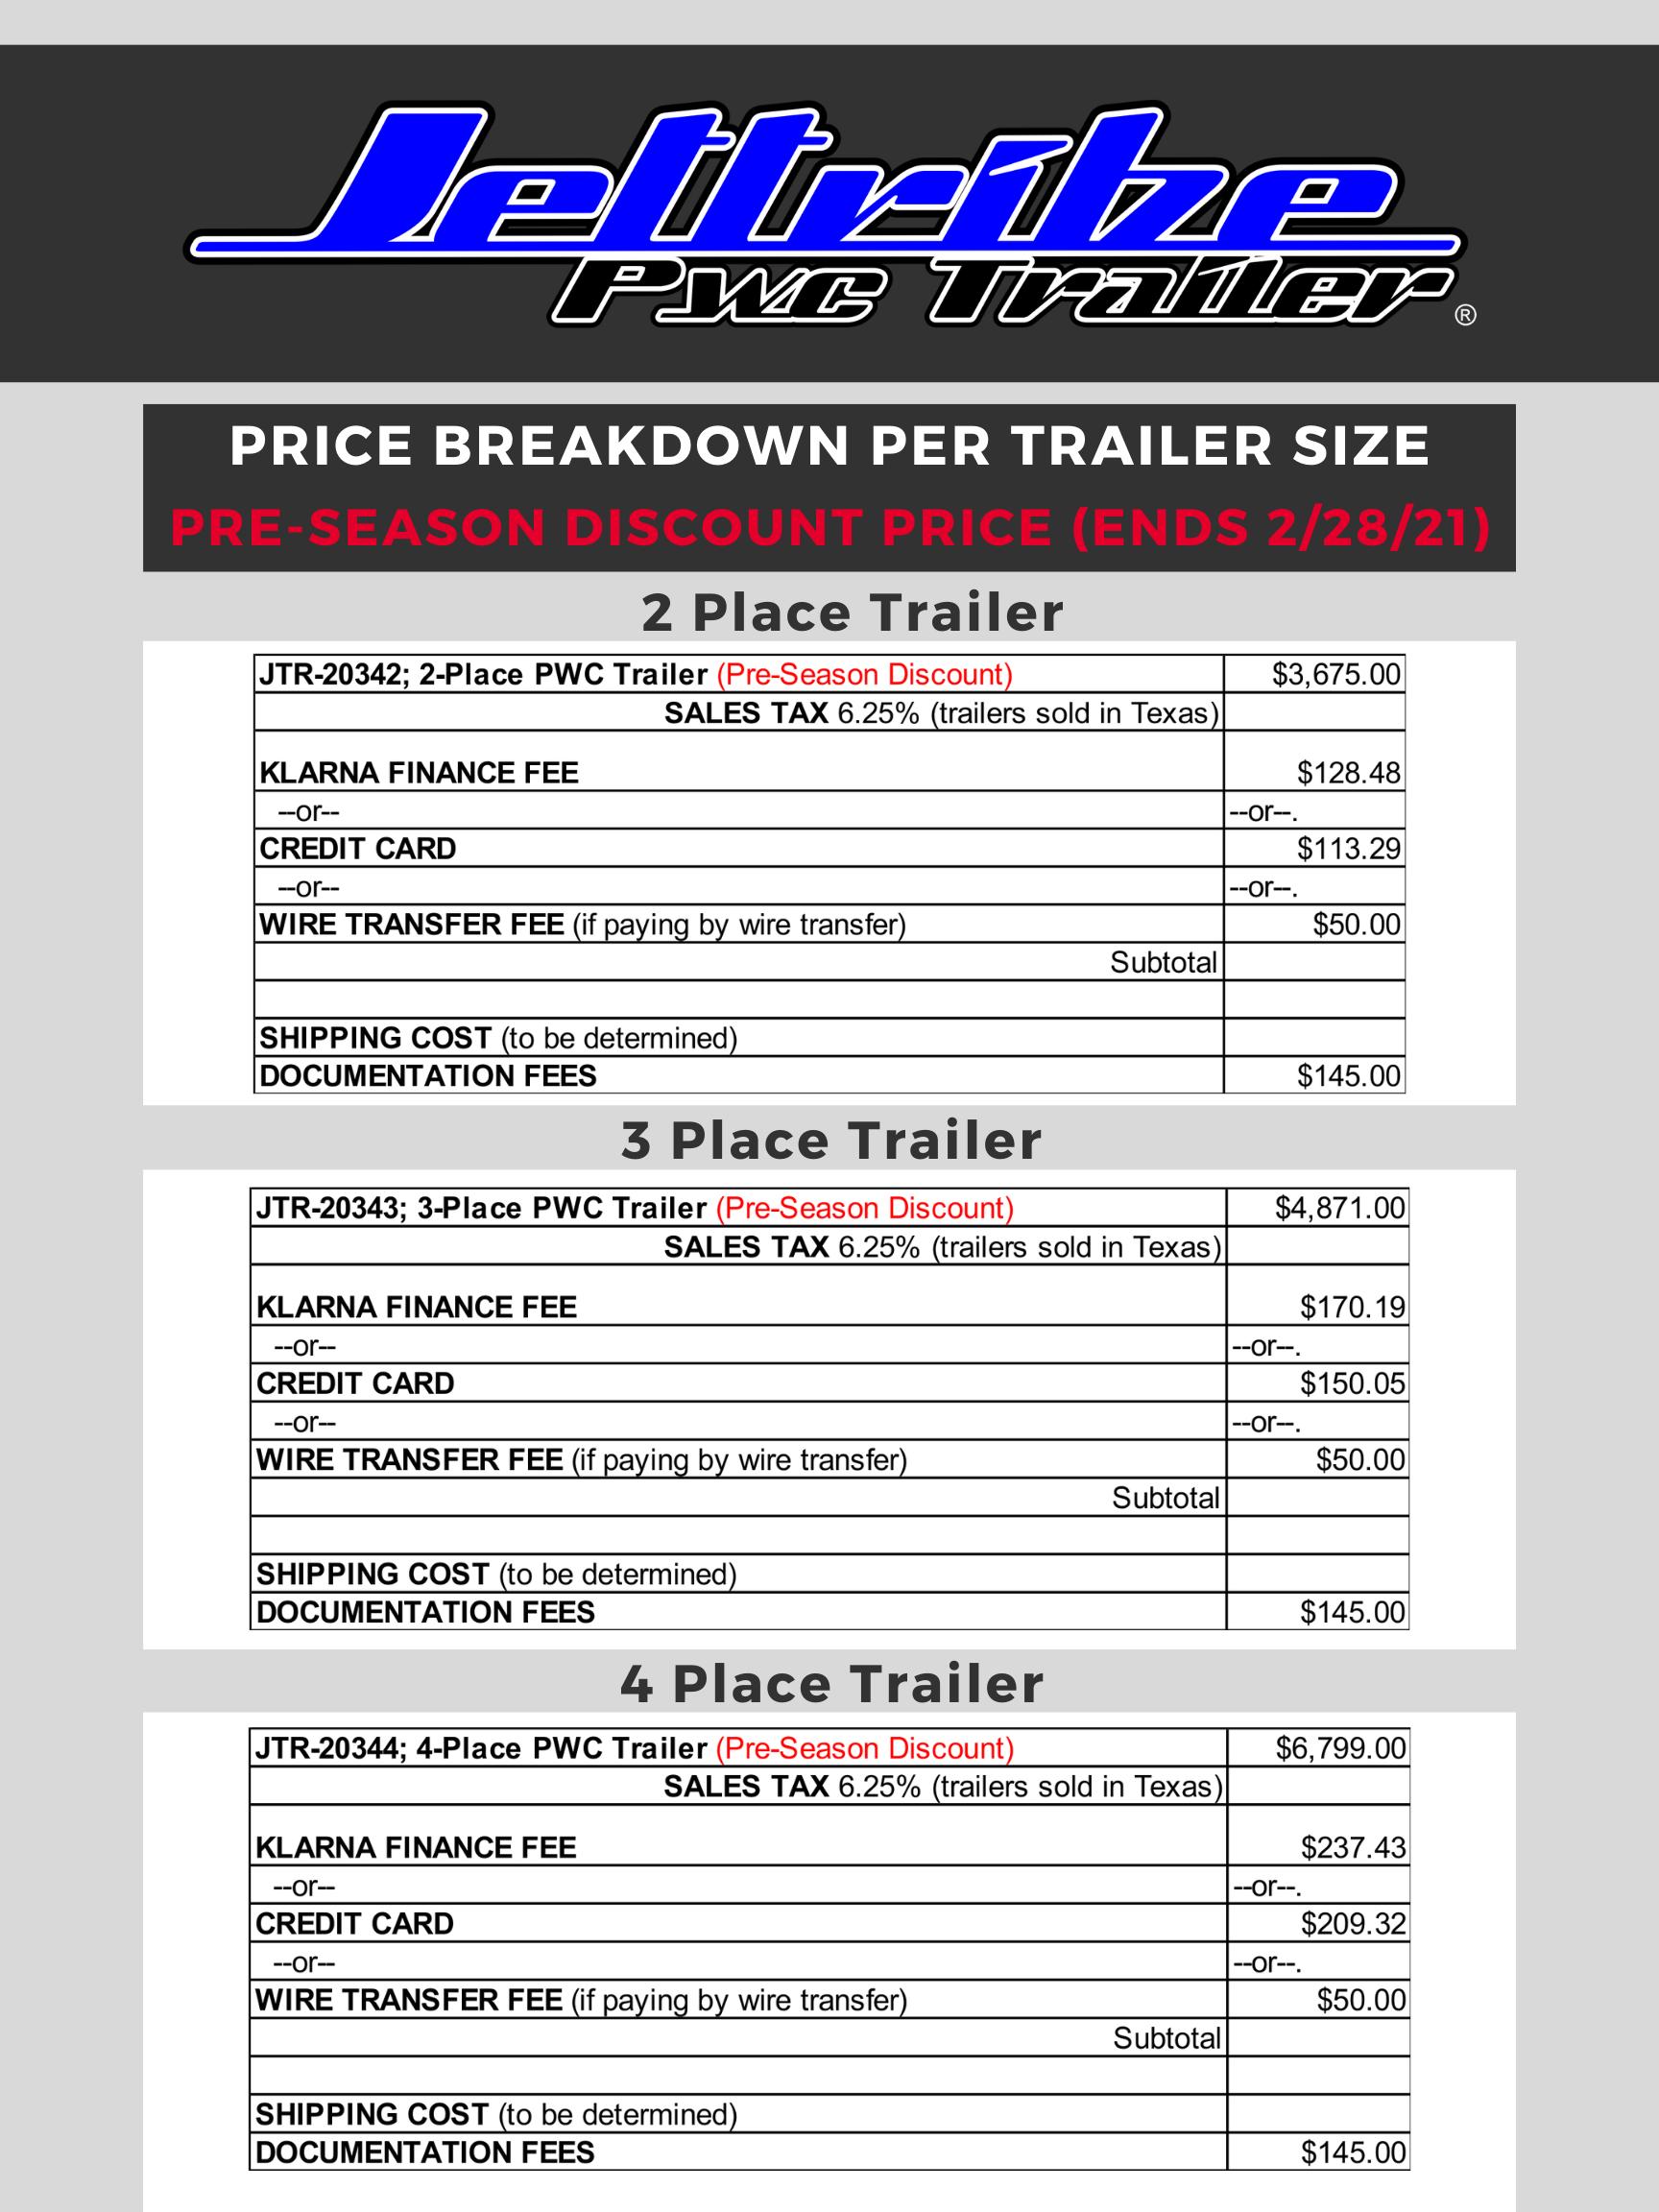 price-breakdown-per-trailer-size-1-.png